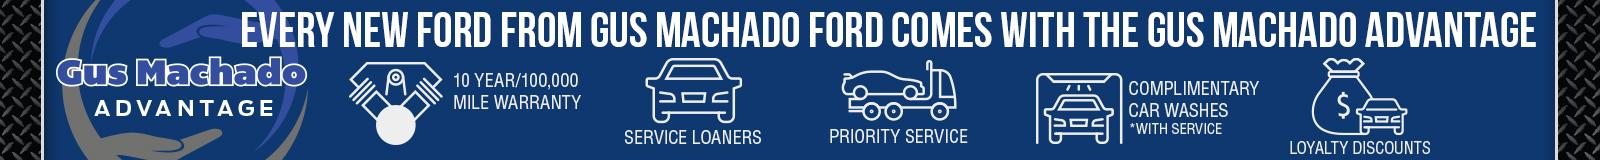 Gus Machado Ford Service >> Gus Machado Ford Of Kendall Ford Dealership Kendall Fl